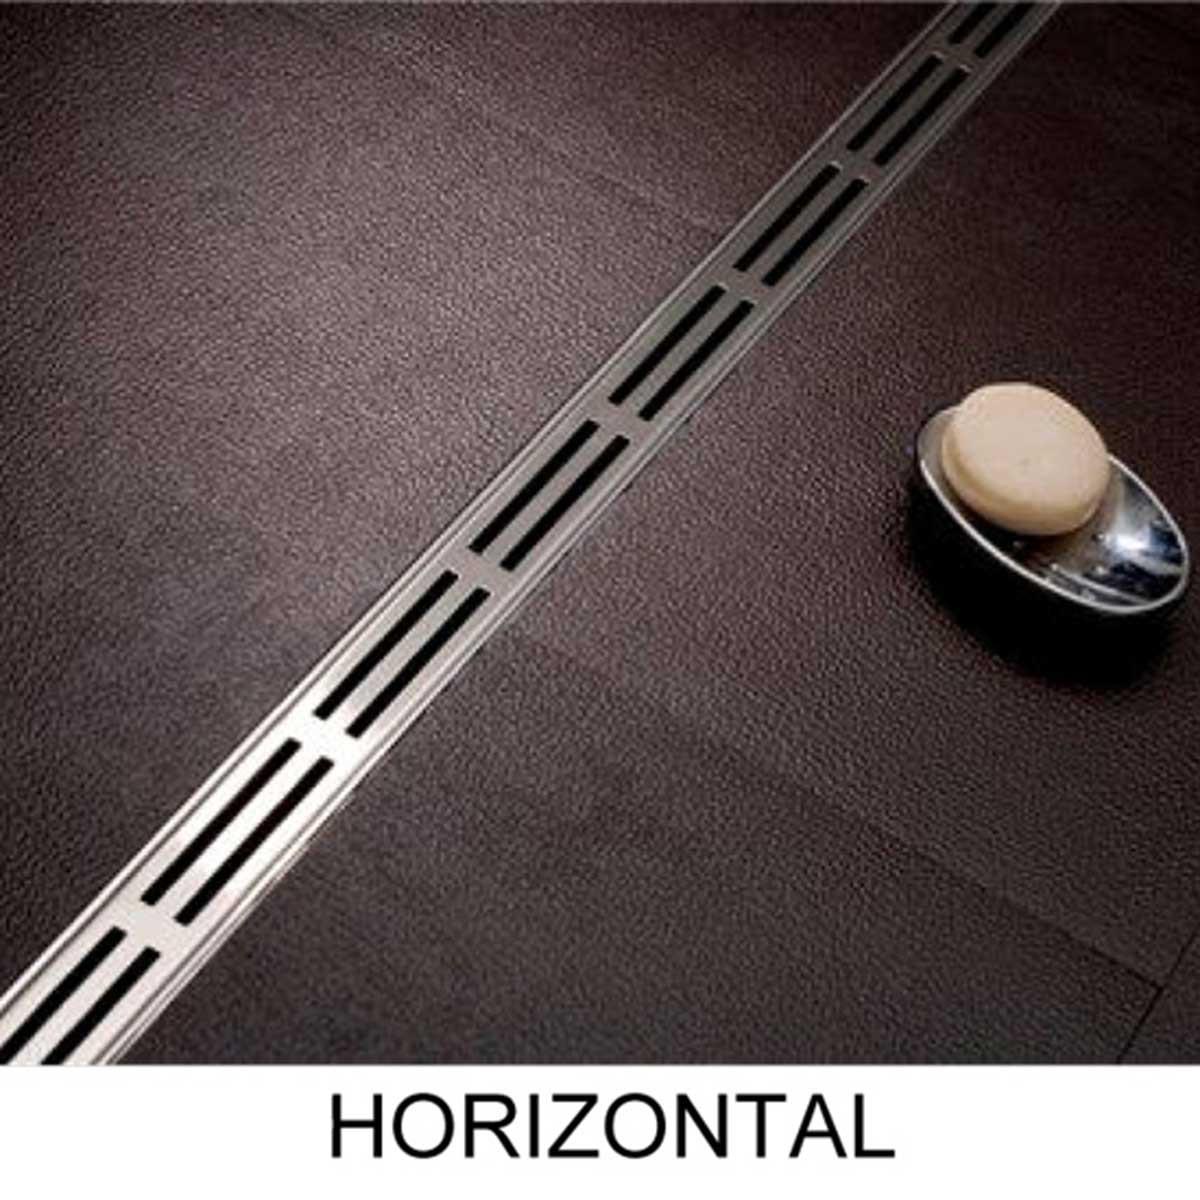 Horizontal Quick Drain ProLine Drain Covers